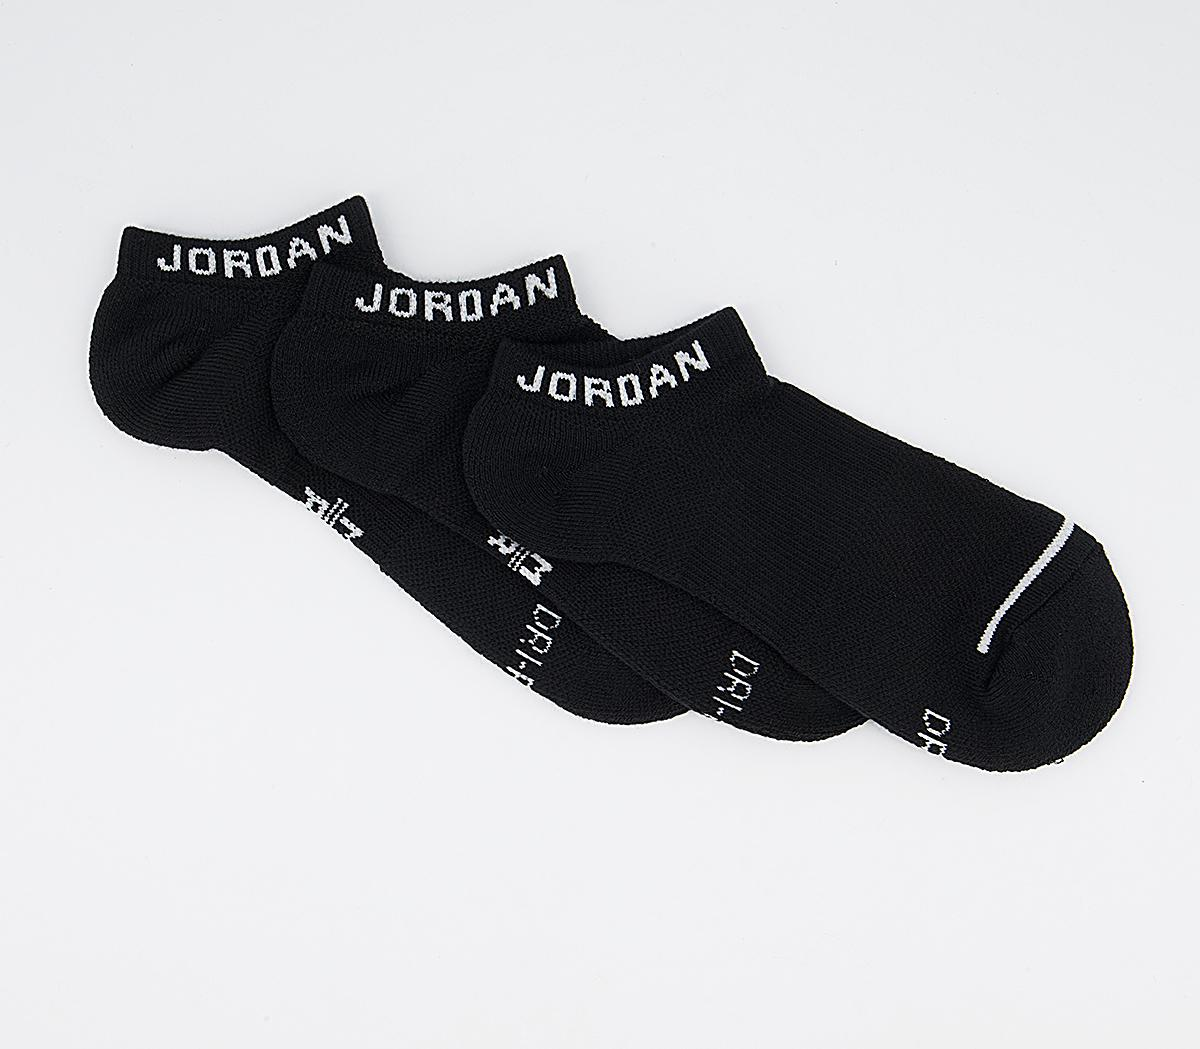 Jordan No Show Socks